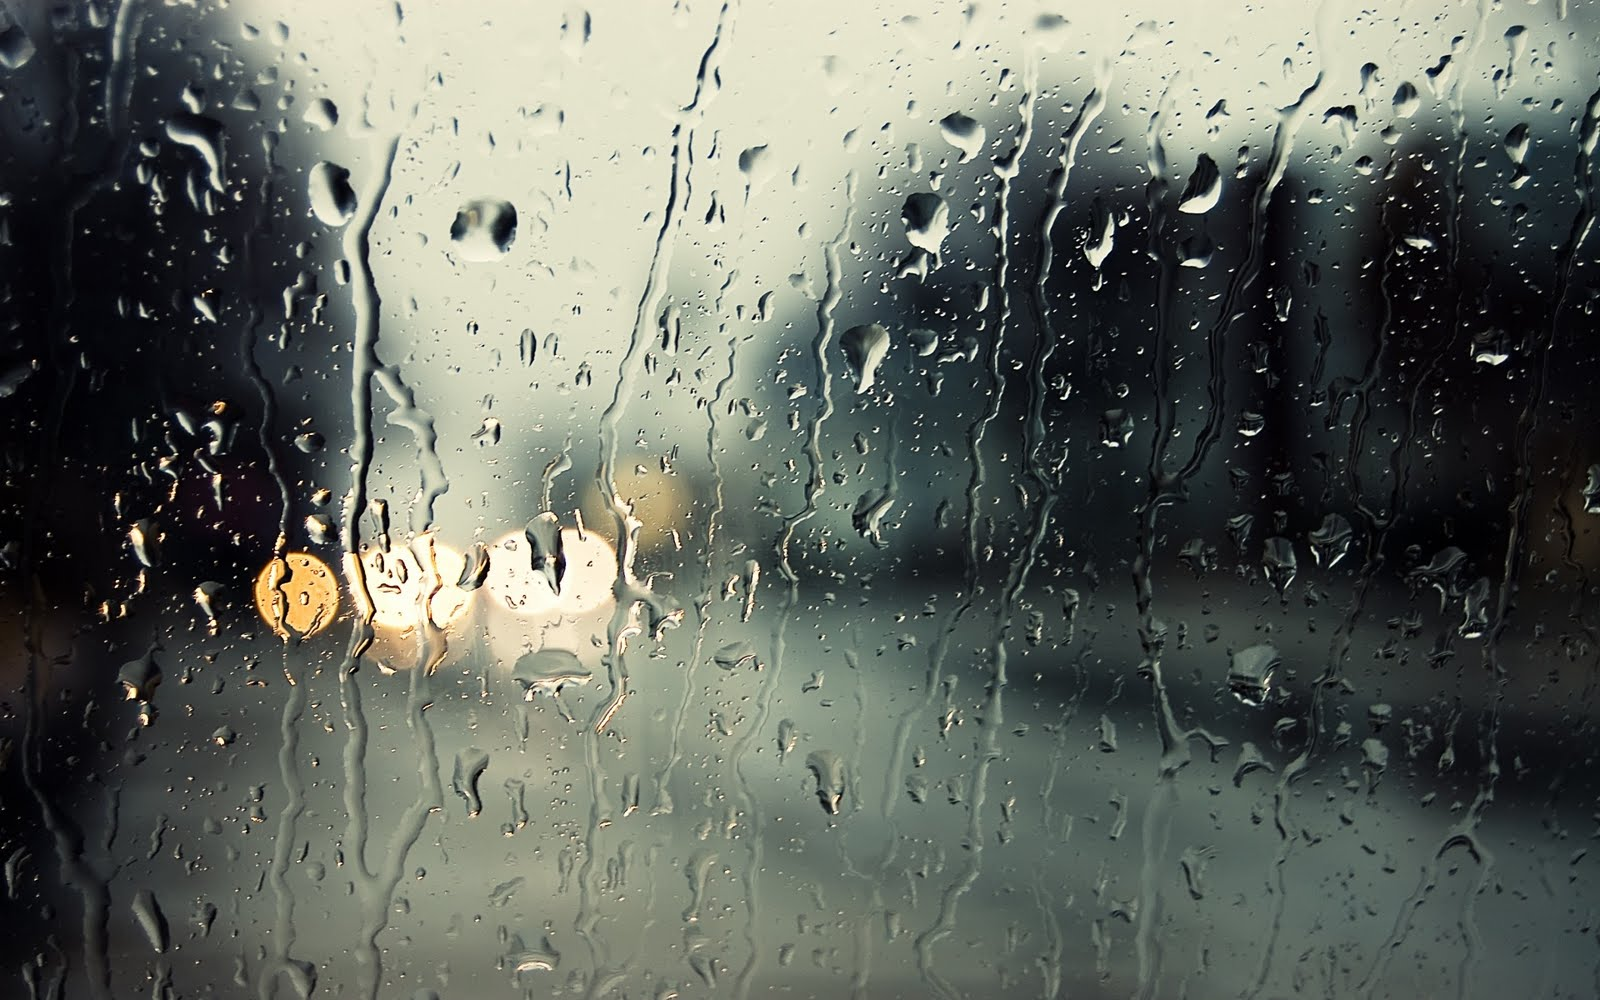 https://3.bp.blogspot.com/-UR2h1yw0LOk/TiQJJcJ_WKI/AAAAAAAAB-E/oRCh49wxS9s/s1600/rain+wallpapers+hd+4.jpg